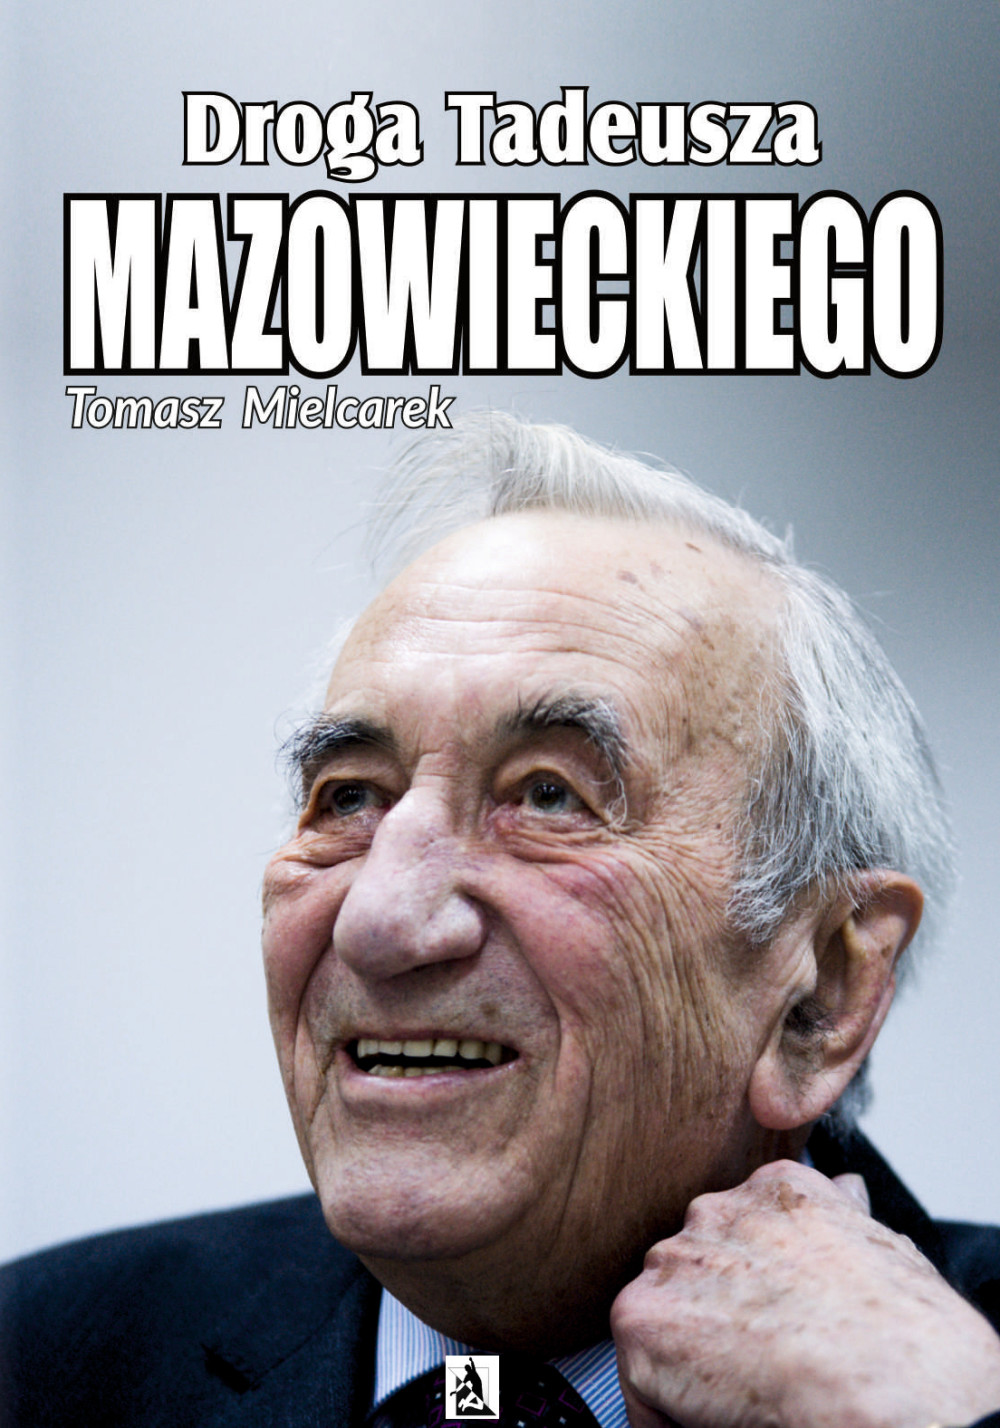 Droga Tadeusza Mazowieckiego ebook